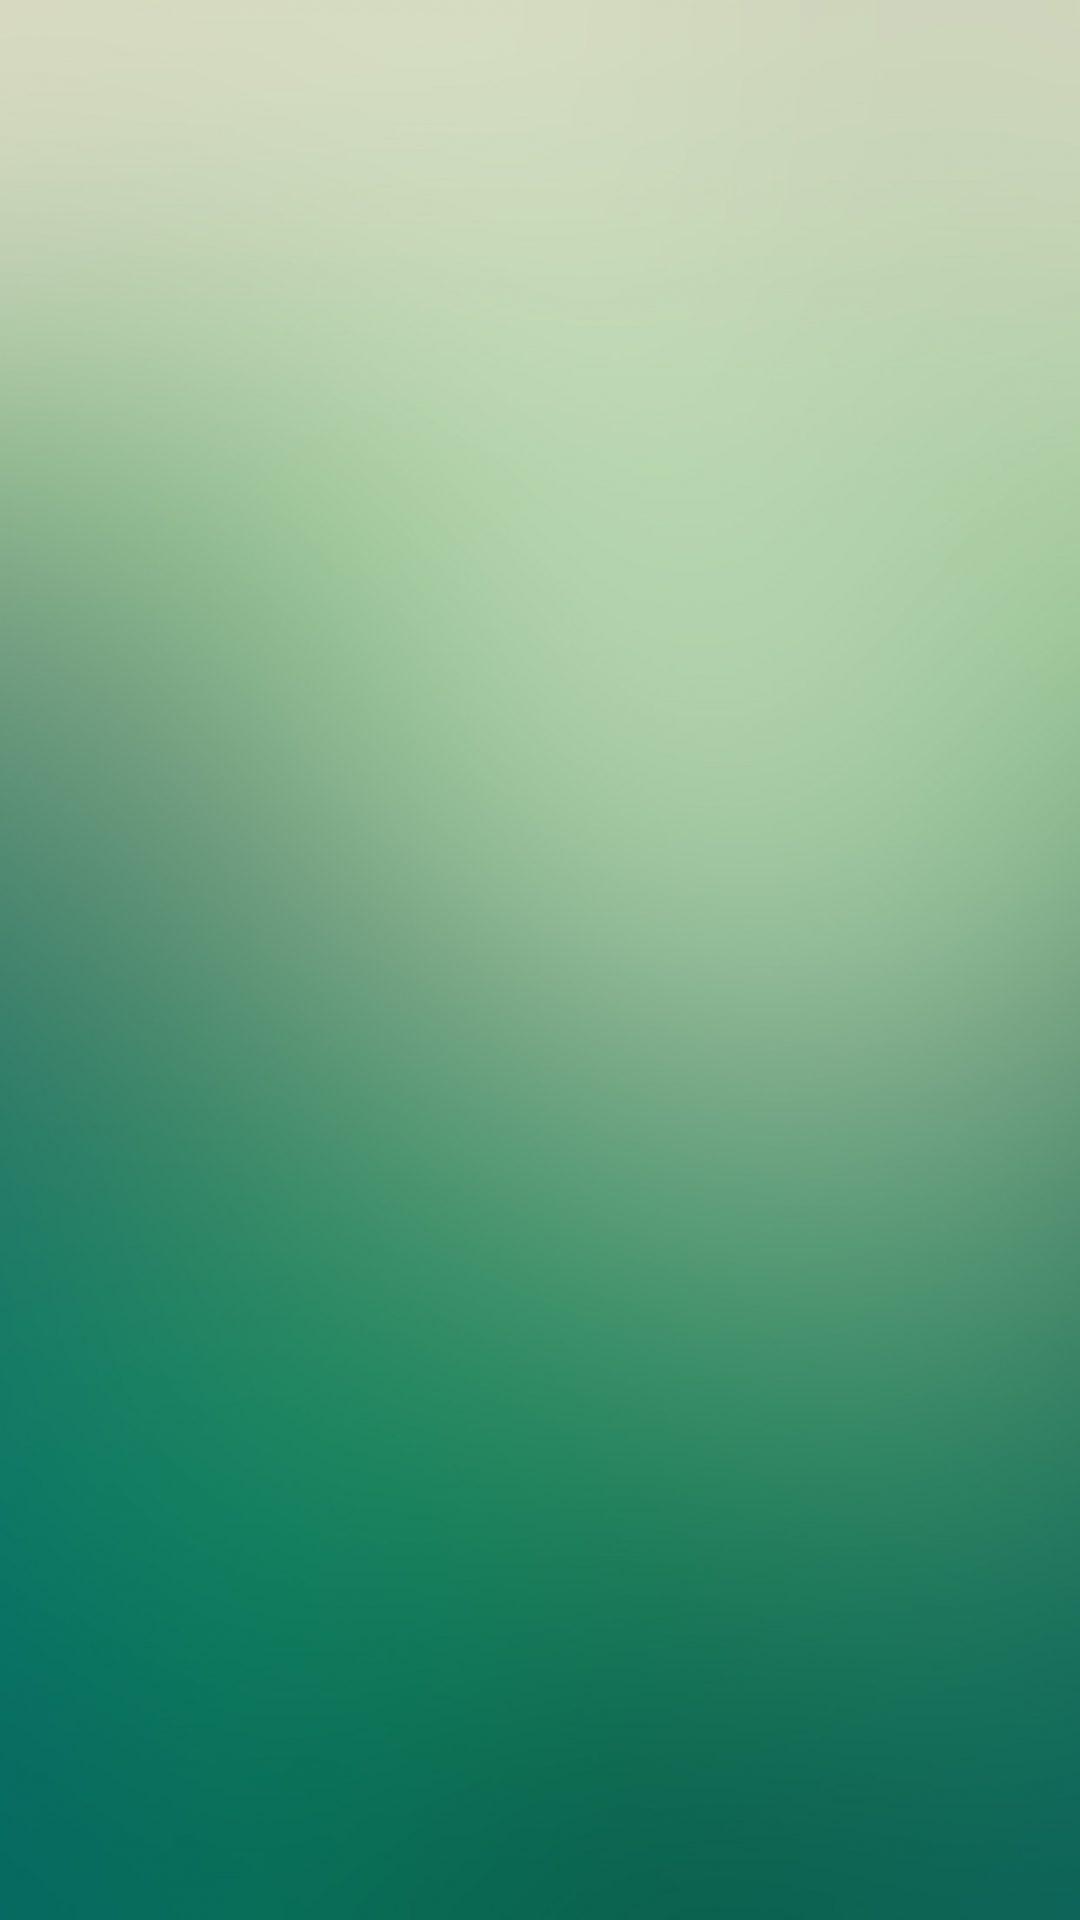 Green Nature Healing Society Gradation Blur